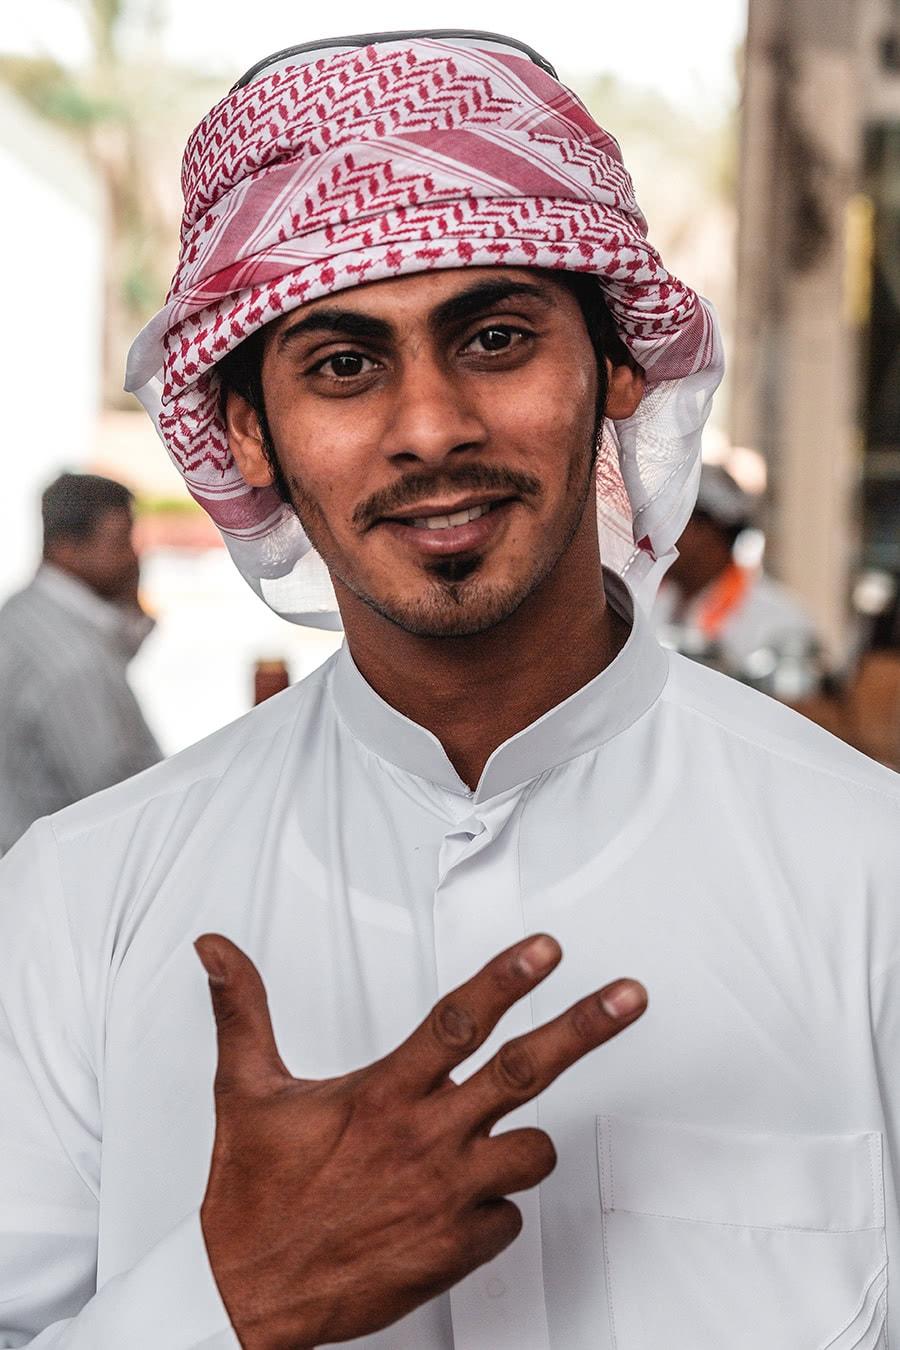 An Emirati man at the Al Ain market.